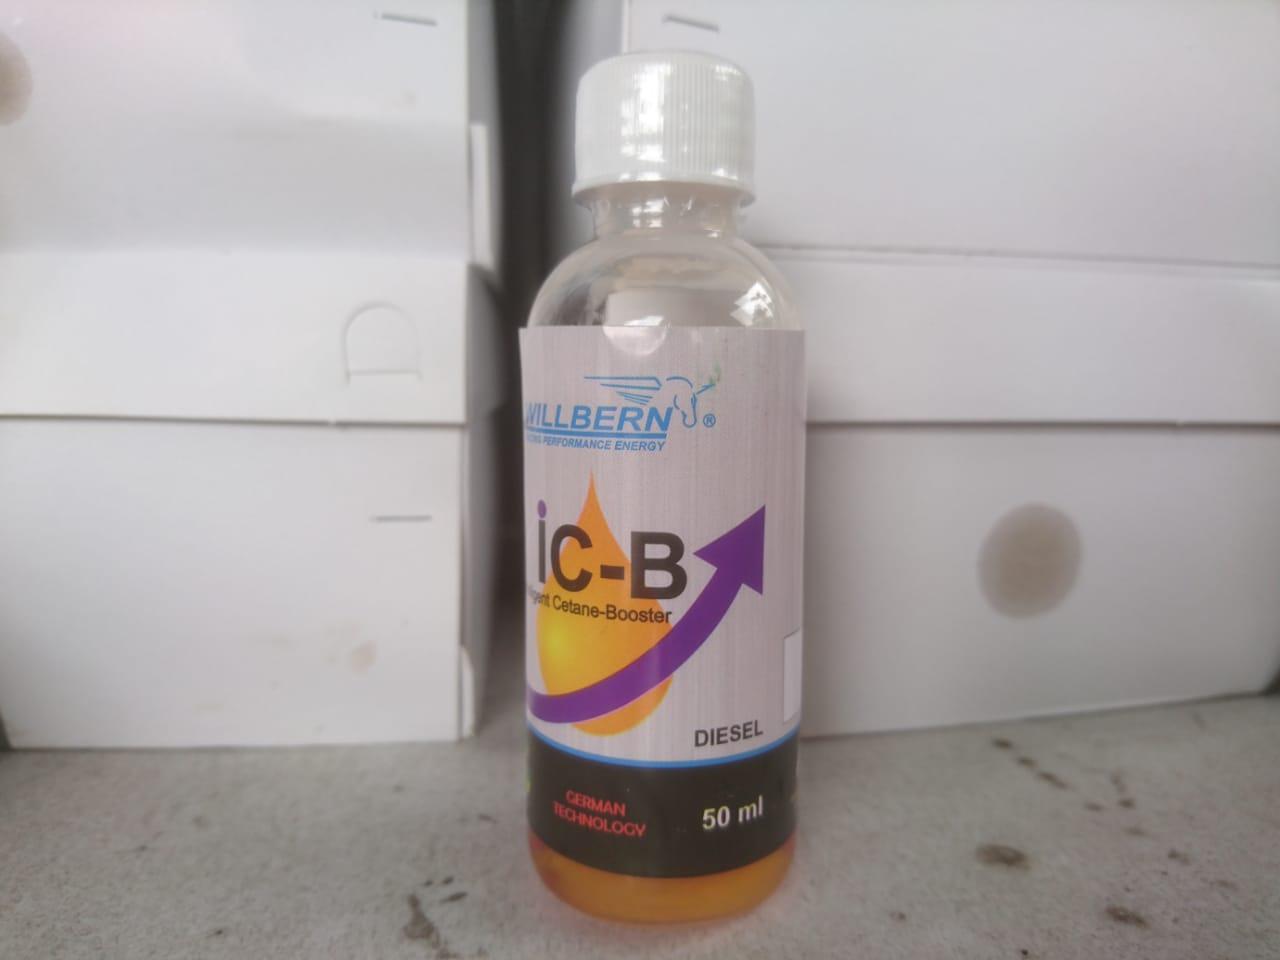 Netralisir Fatty Acid di Solar B20 dengan Cairan Kimia